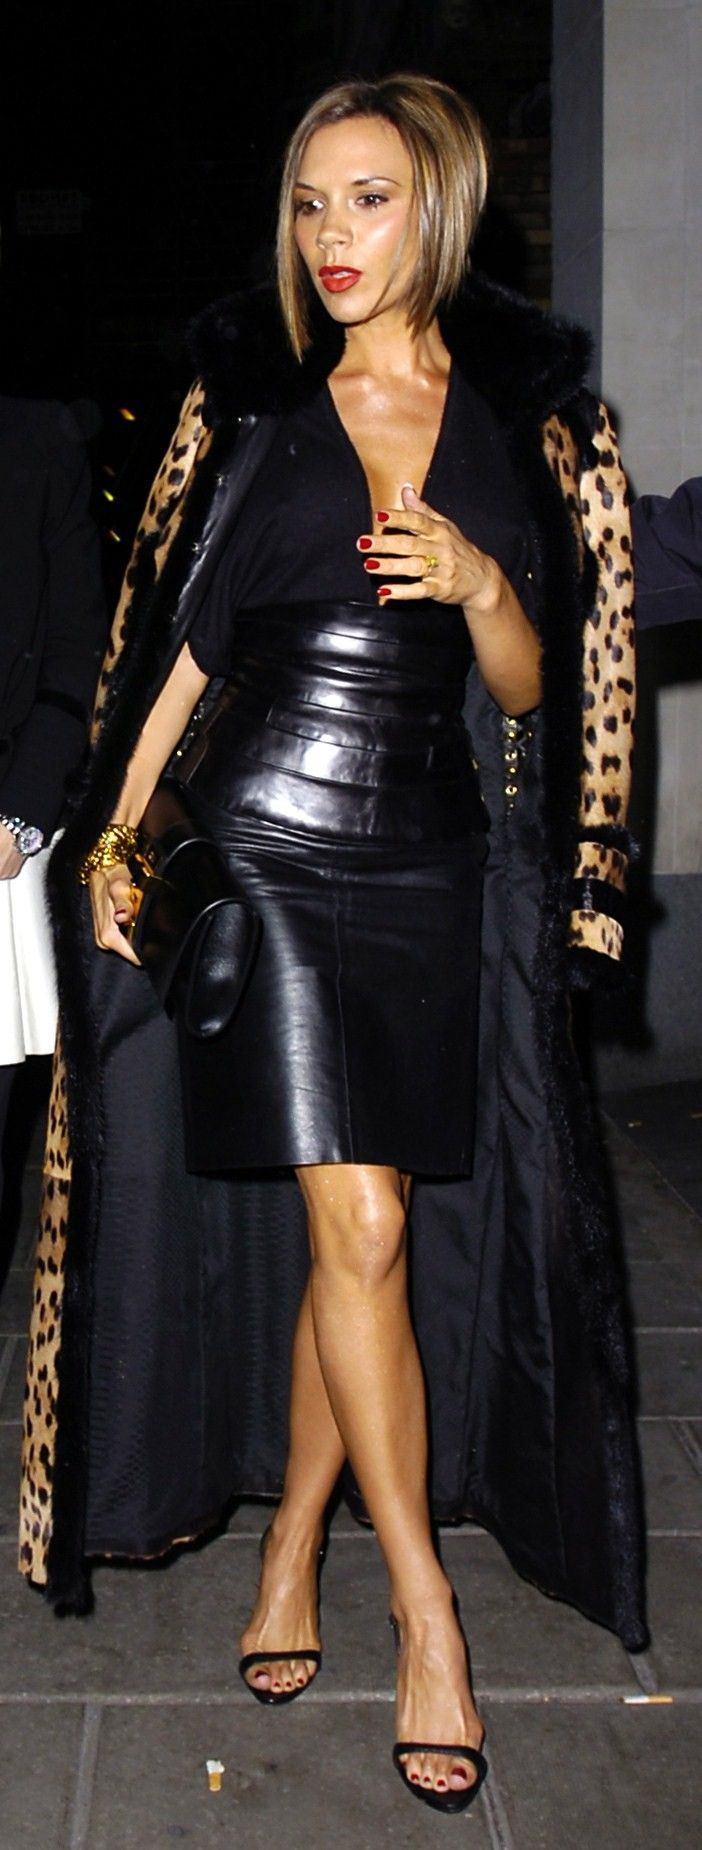 Best 25  Long leather skirt ideas on Pinterest | Leather skirts ...